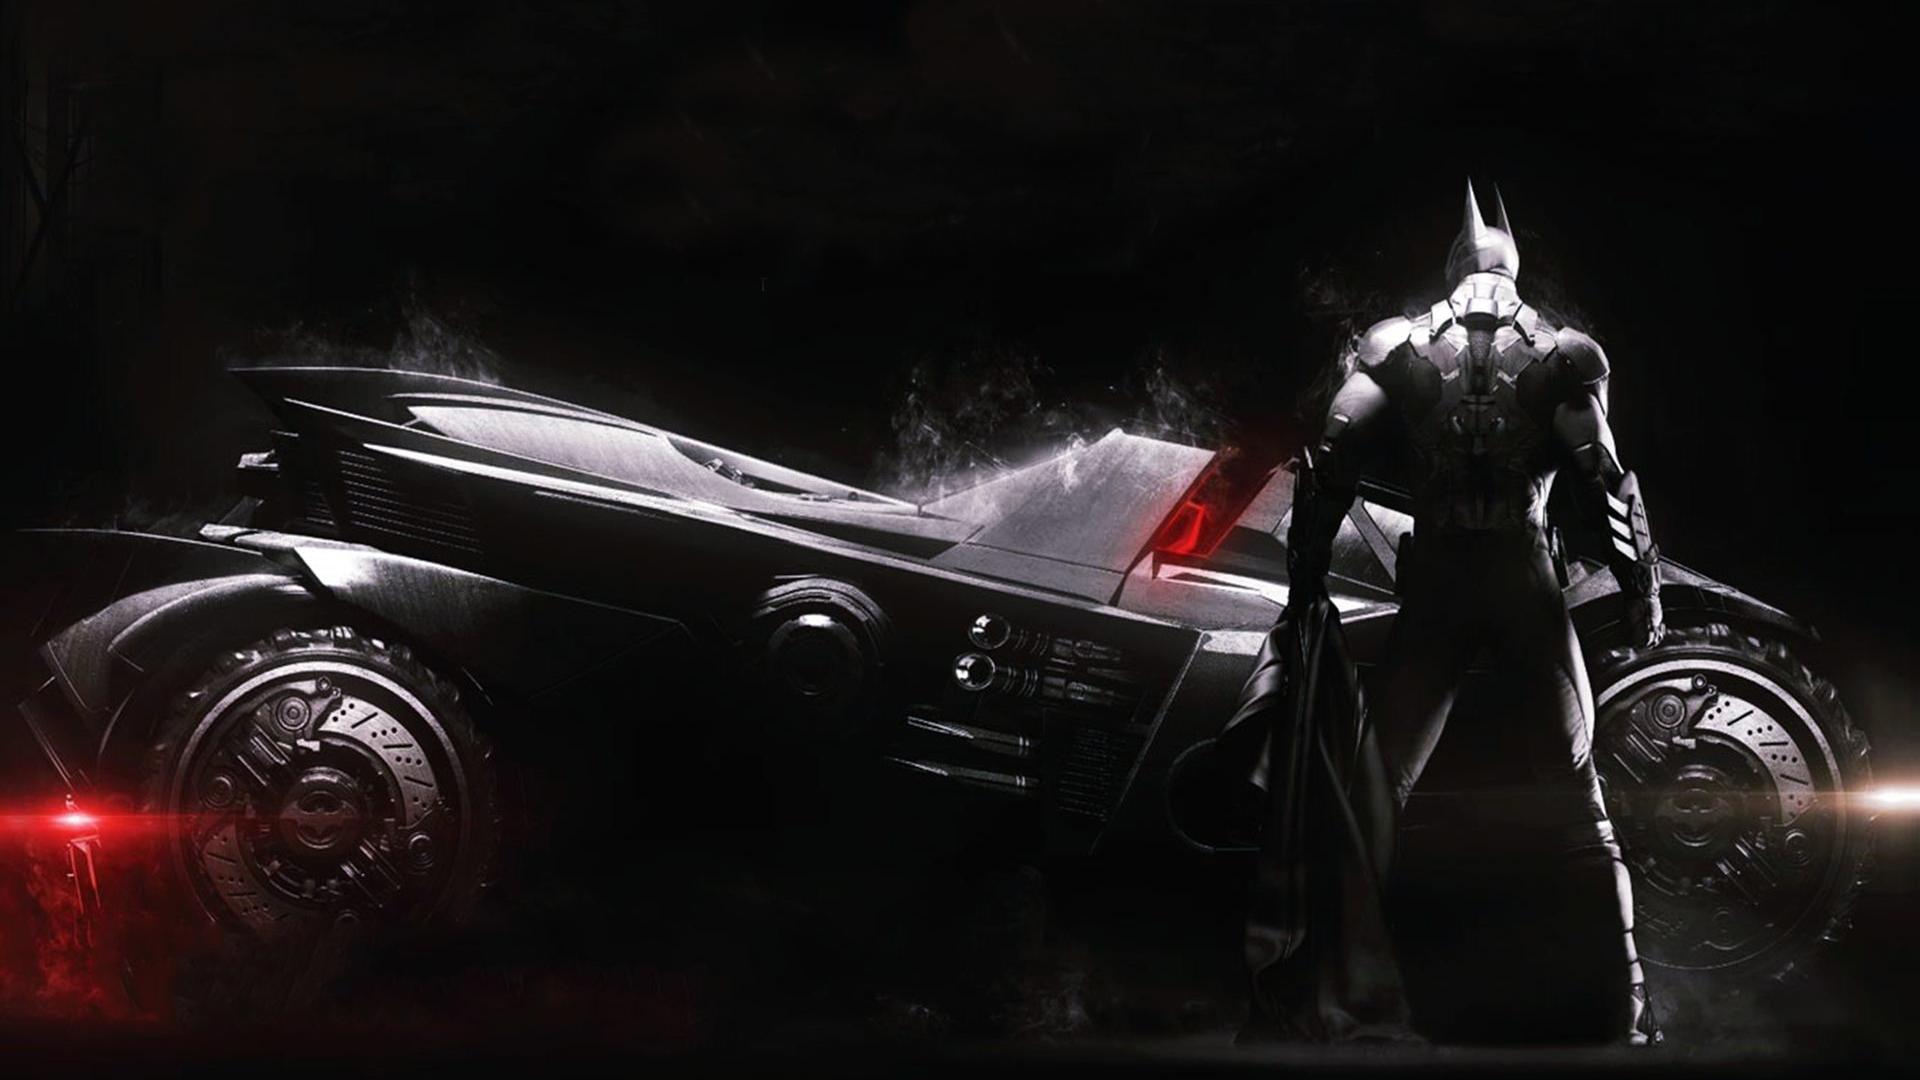 Batman Arkham Knight HD Wallpapers Backgrounds 1920x1080